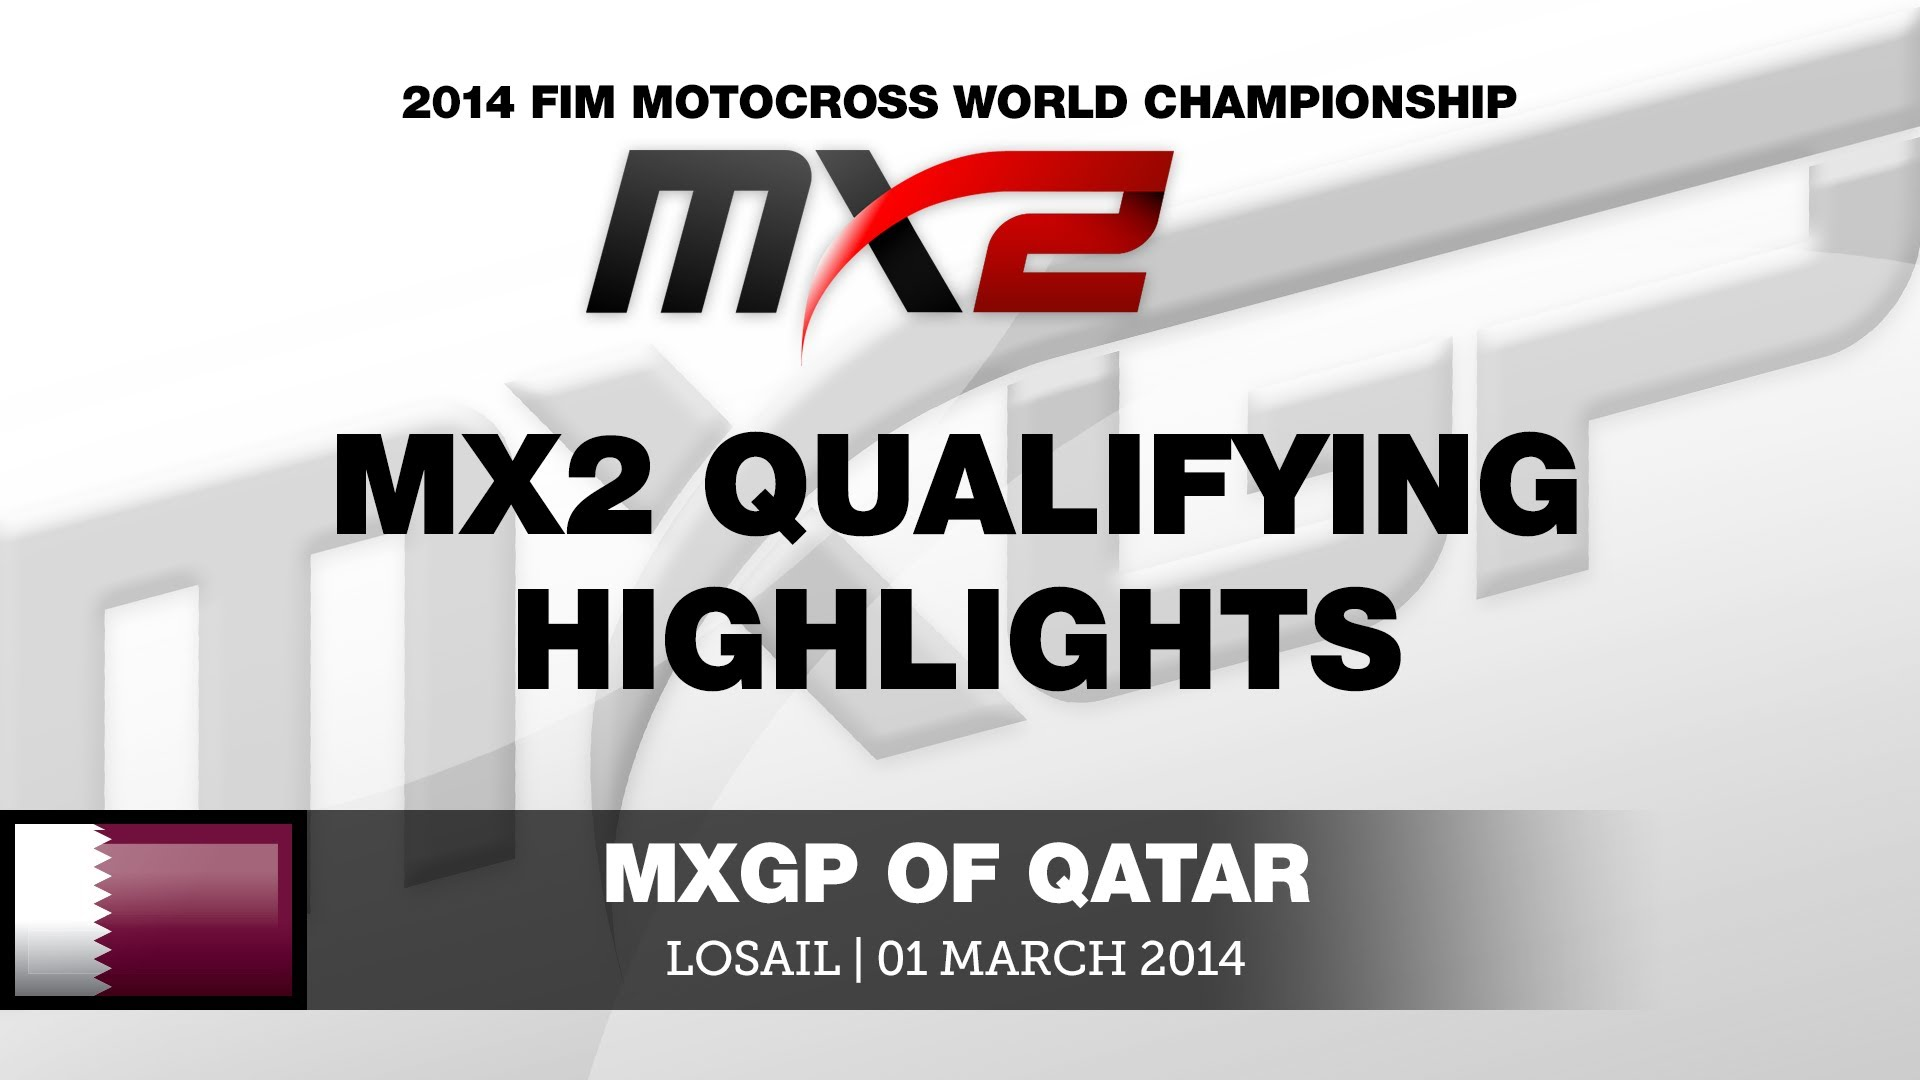 MXGP of Qatar 2014 MX2 i MXGP Qualifying Highlights